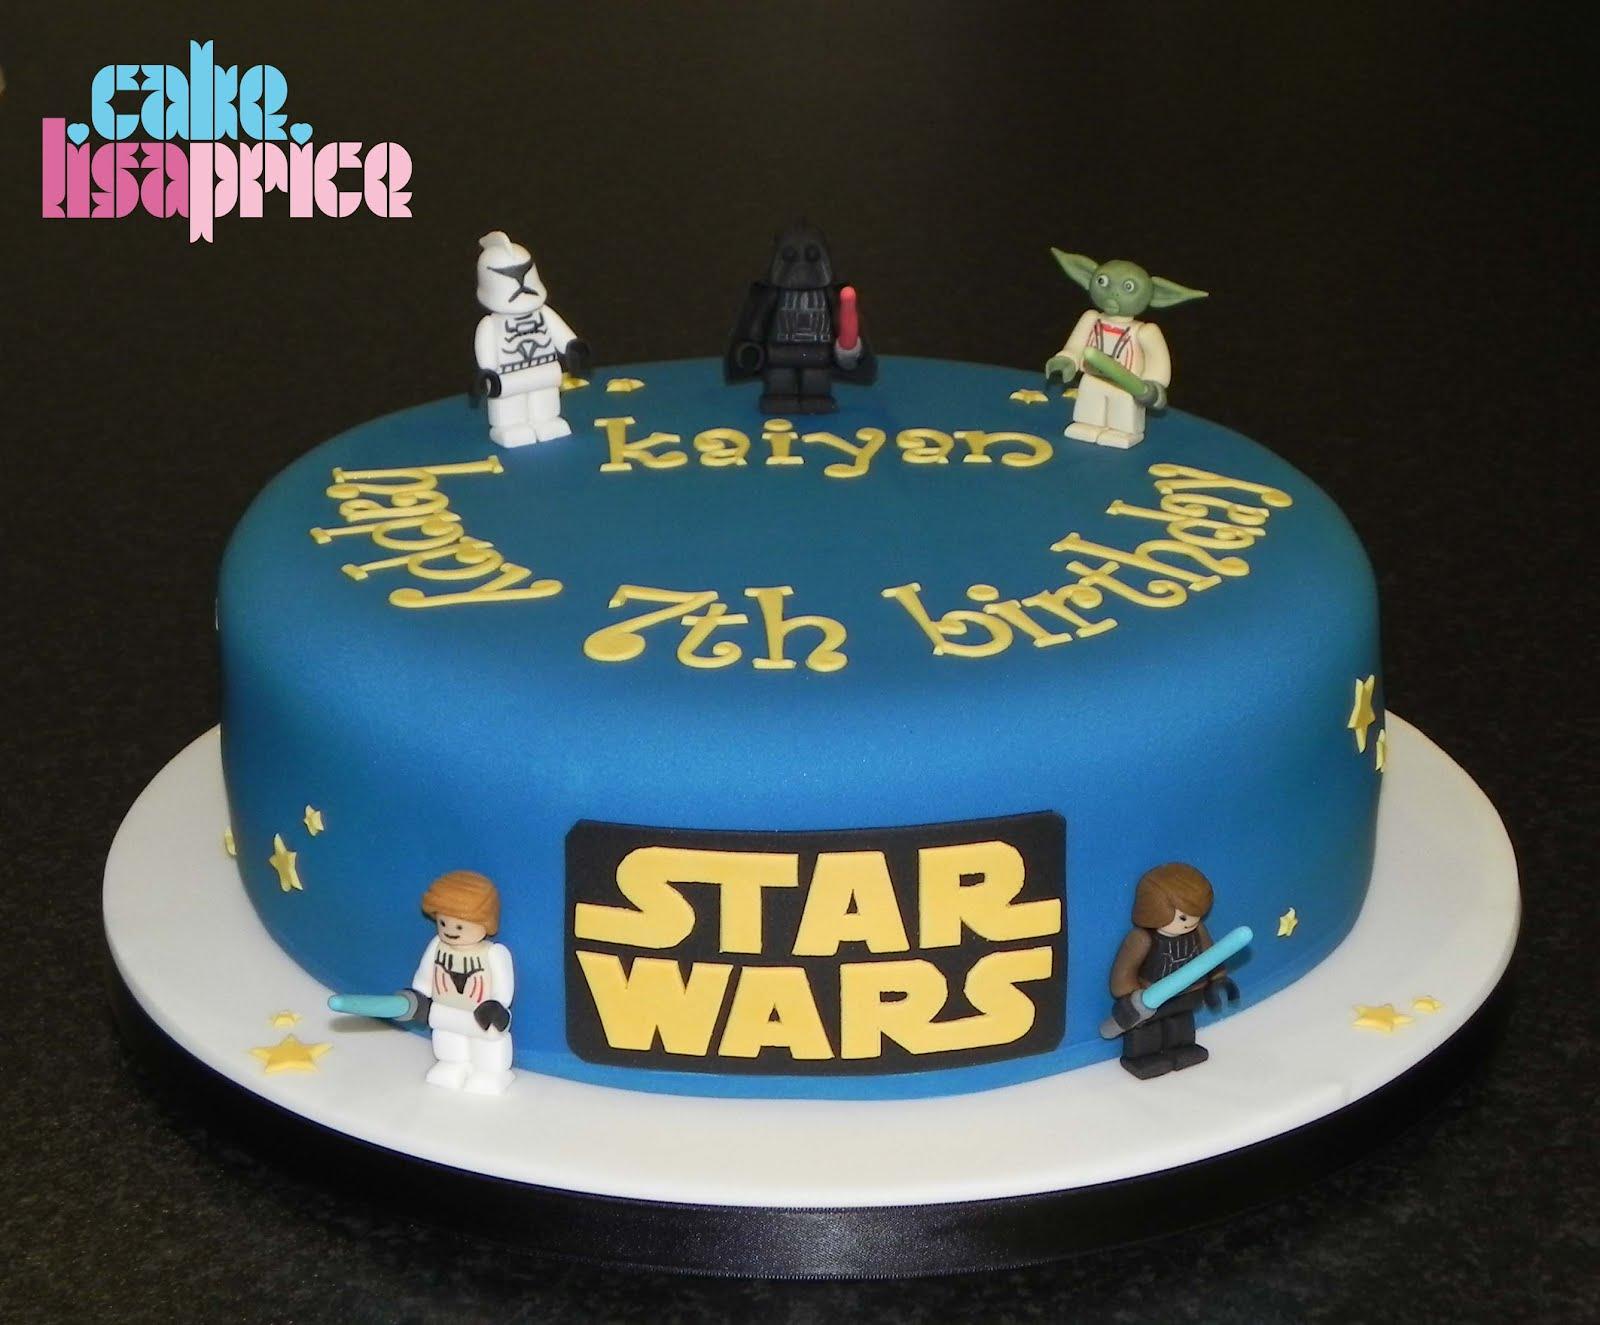 Cake by Lisa Price: LEGO Star Wars cake